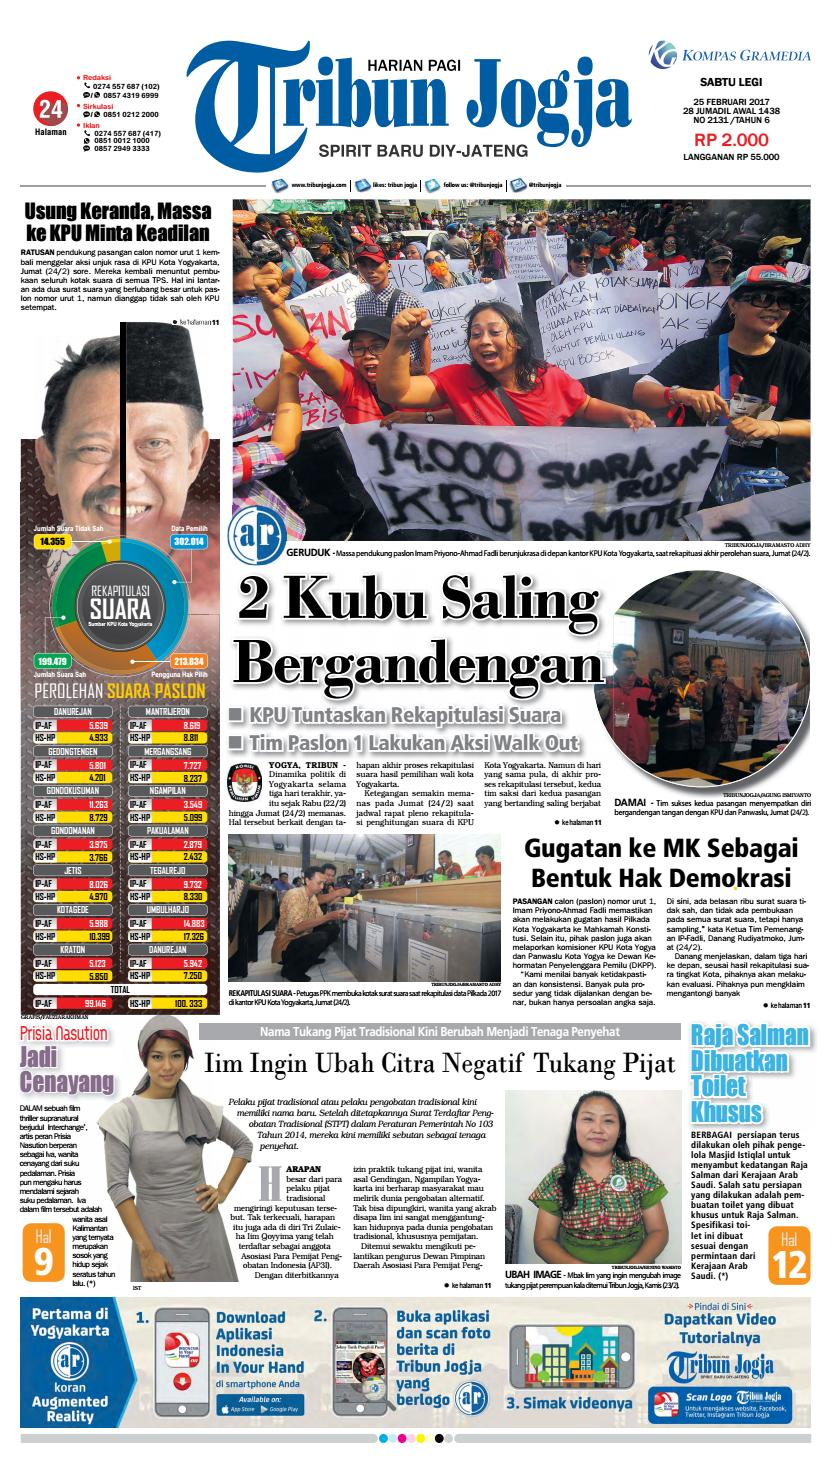 Tribunjogja 25 02 2017 By Tribun Jogja Issuu Produk Ukm Bumn Bakso Ikan Tuna Khas Ambon